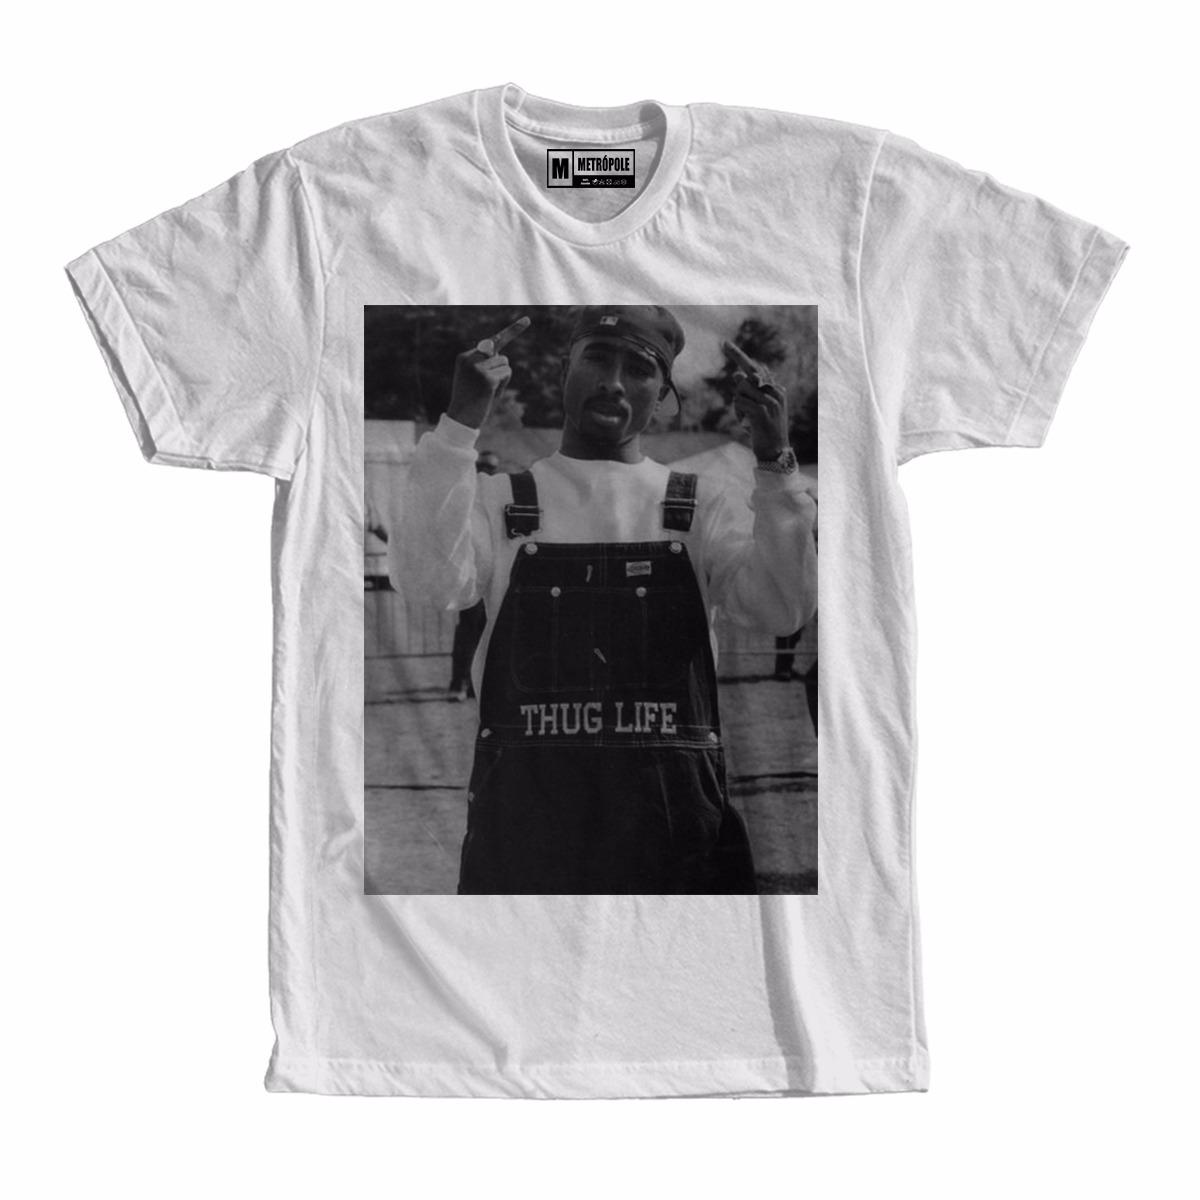 657fd7597 camiseta camisa tupac tu pac 2pac rap hip hop bronx ny la. Carregando zoom.